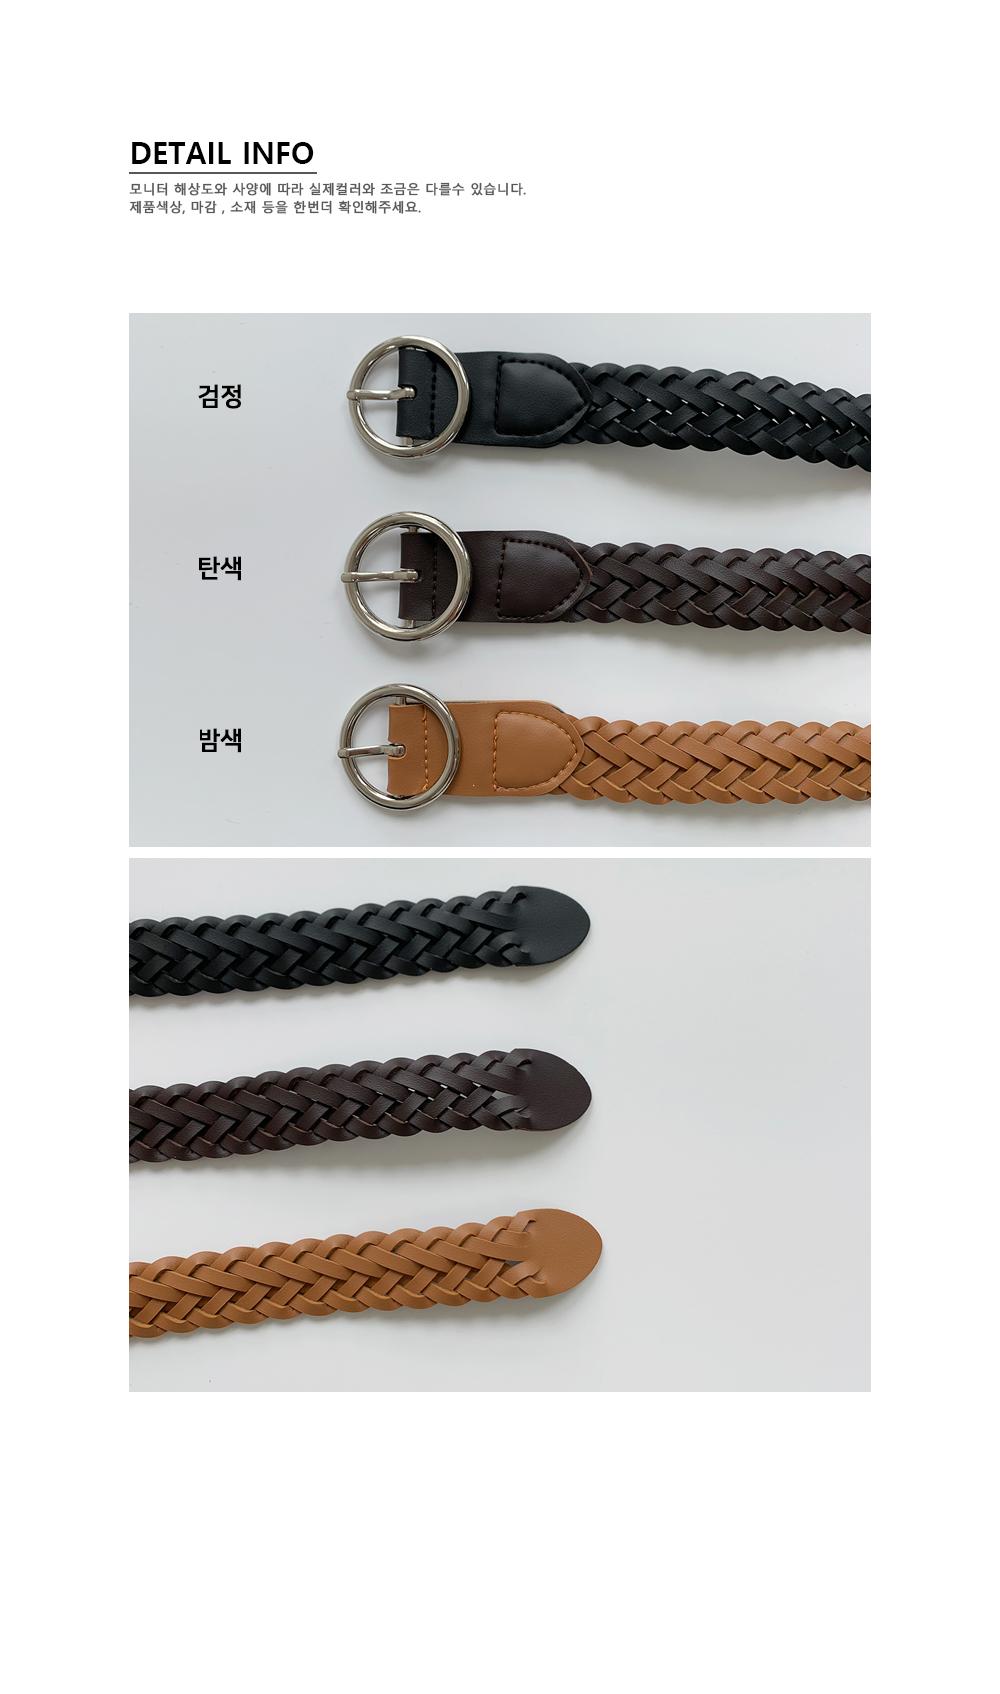 25mm mesh twist belt